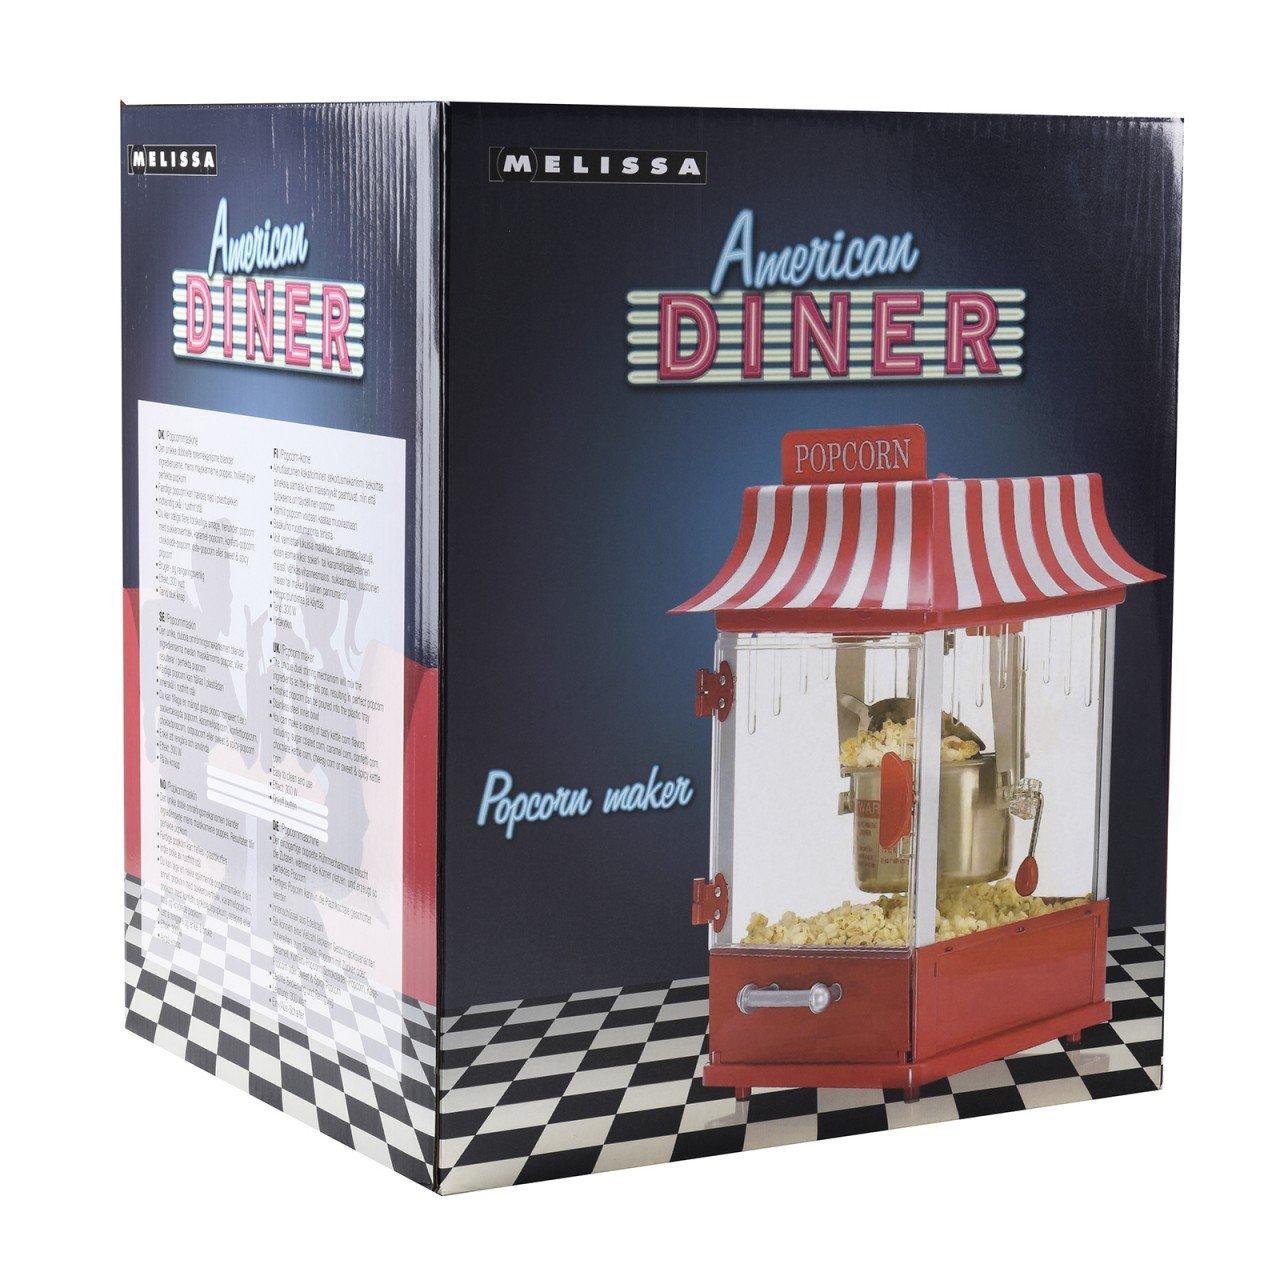 Melissa Popcorn Maker/eléctrica en American Diner Retro ...